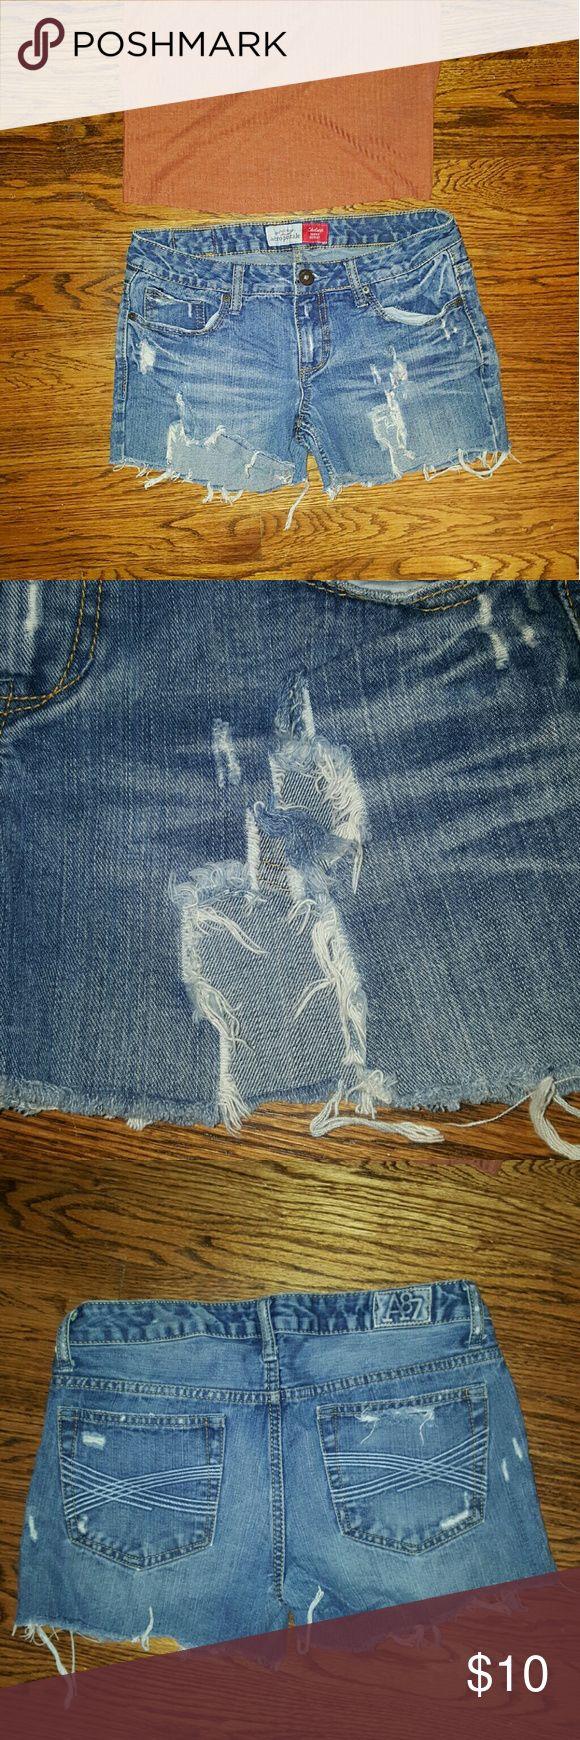 Distressed Cutoff Jean Shorts Aeropostale Distressed Cutoff Jean Shorts, low rise, medium wash, high cut up the leg, size 5/6 regular Aeropostale Shorts Jean Shorts